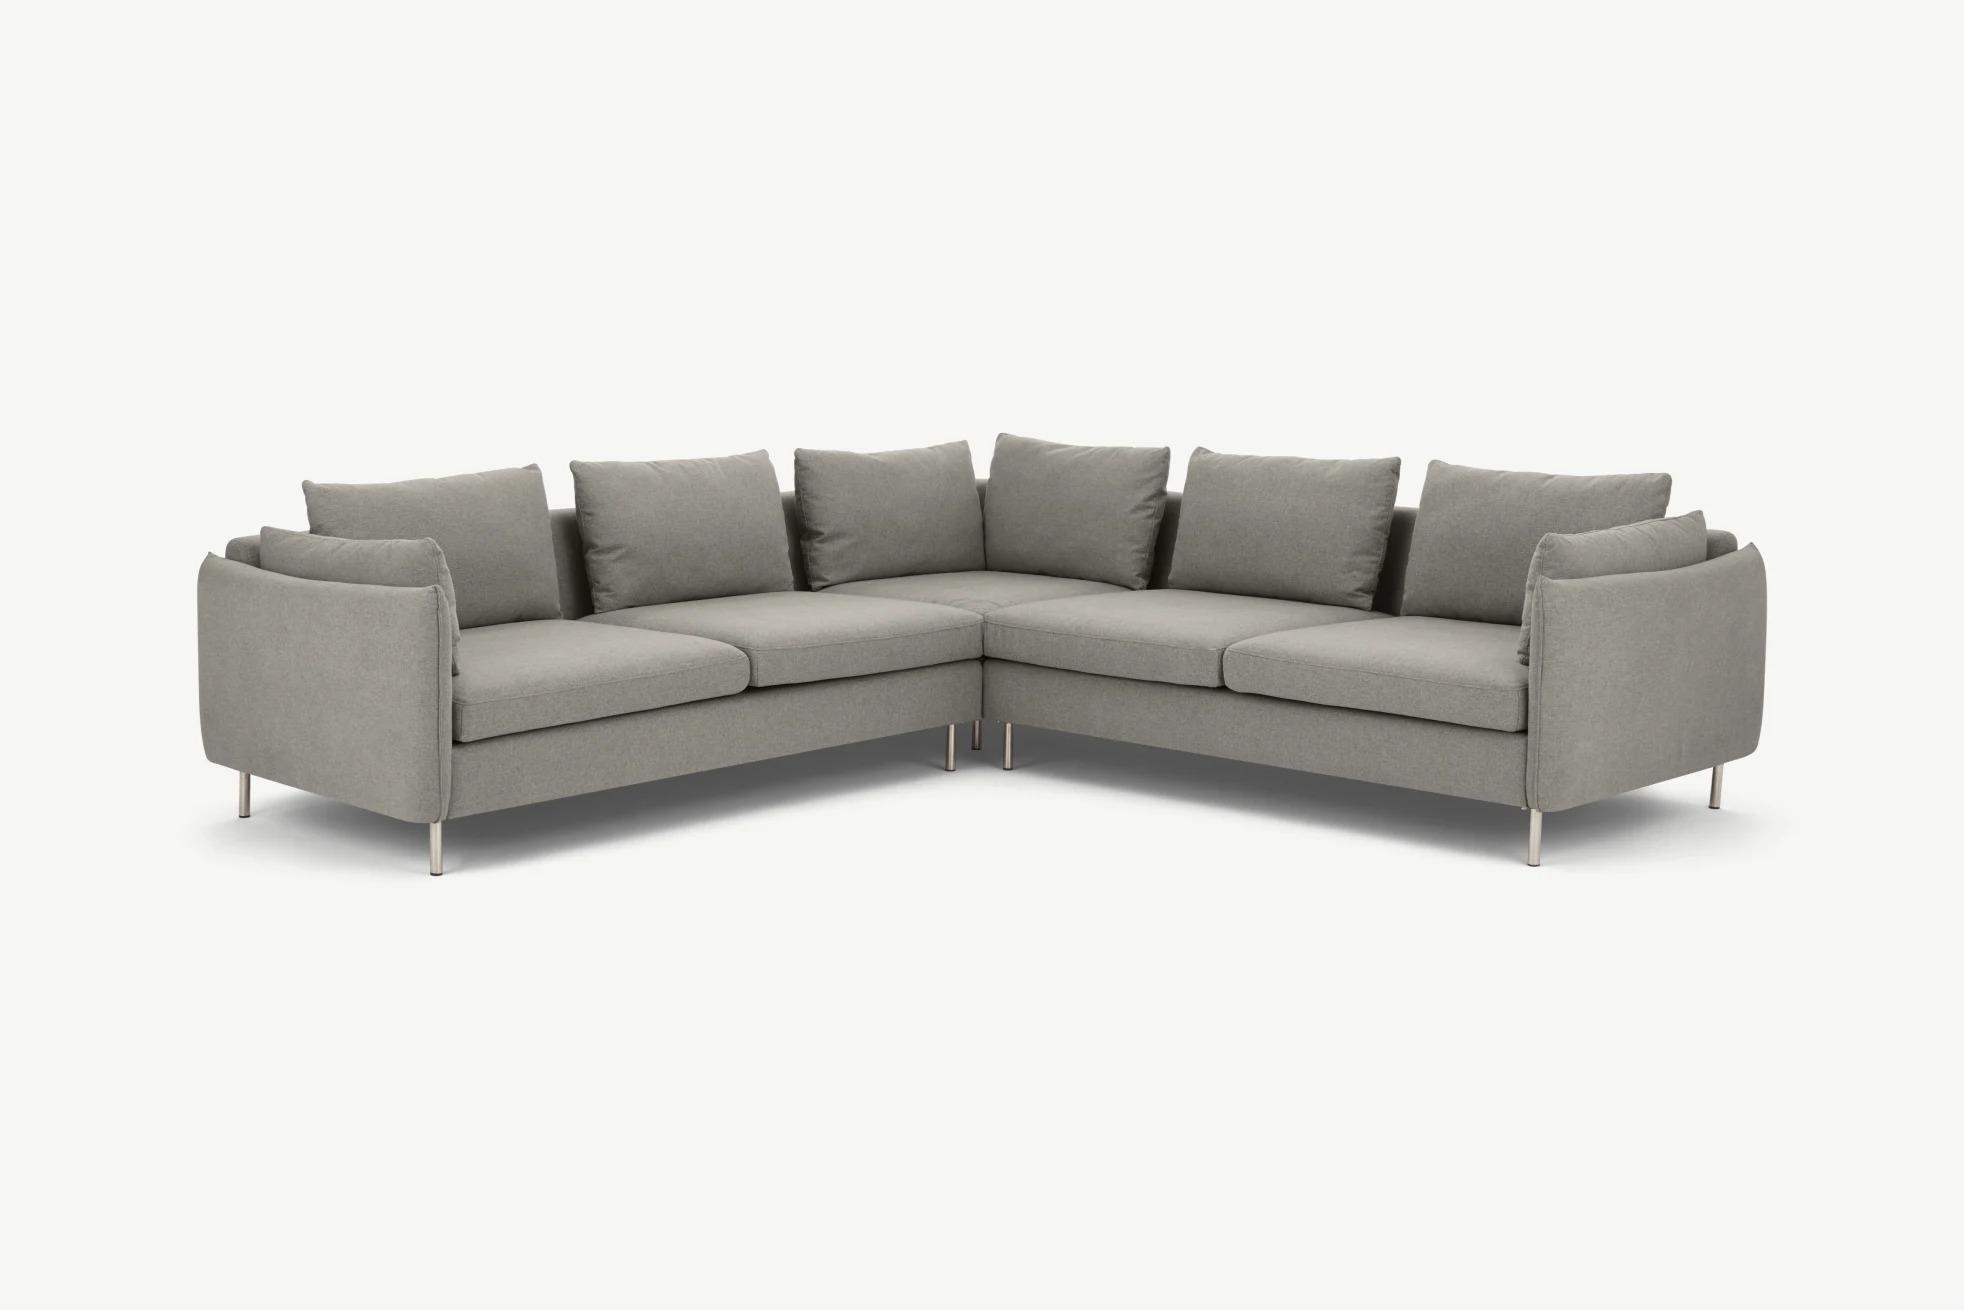 Vento 5 Seater Corner Sofa, Manhattan Grey